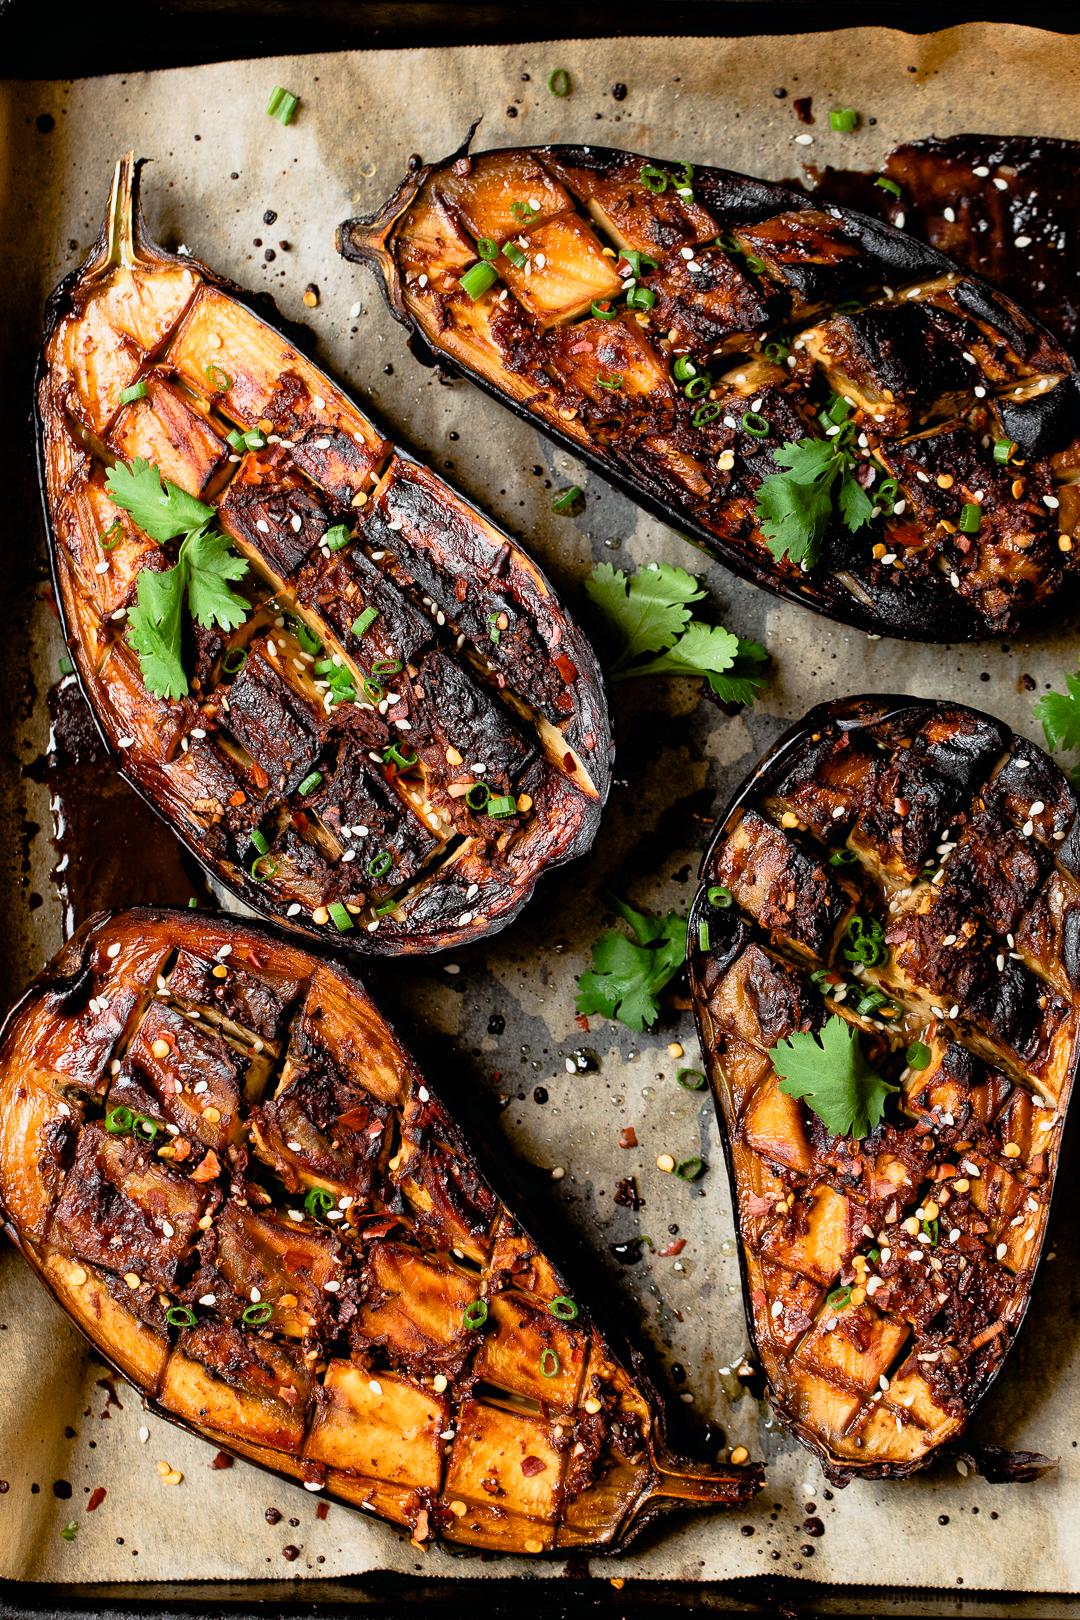 Ginger_Miso_Glazed_Eggplant_by_Jordan_Pie_Nutritionist_Photographer-1.jpg